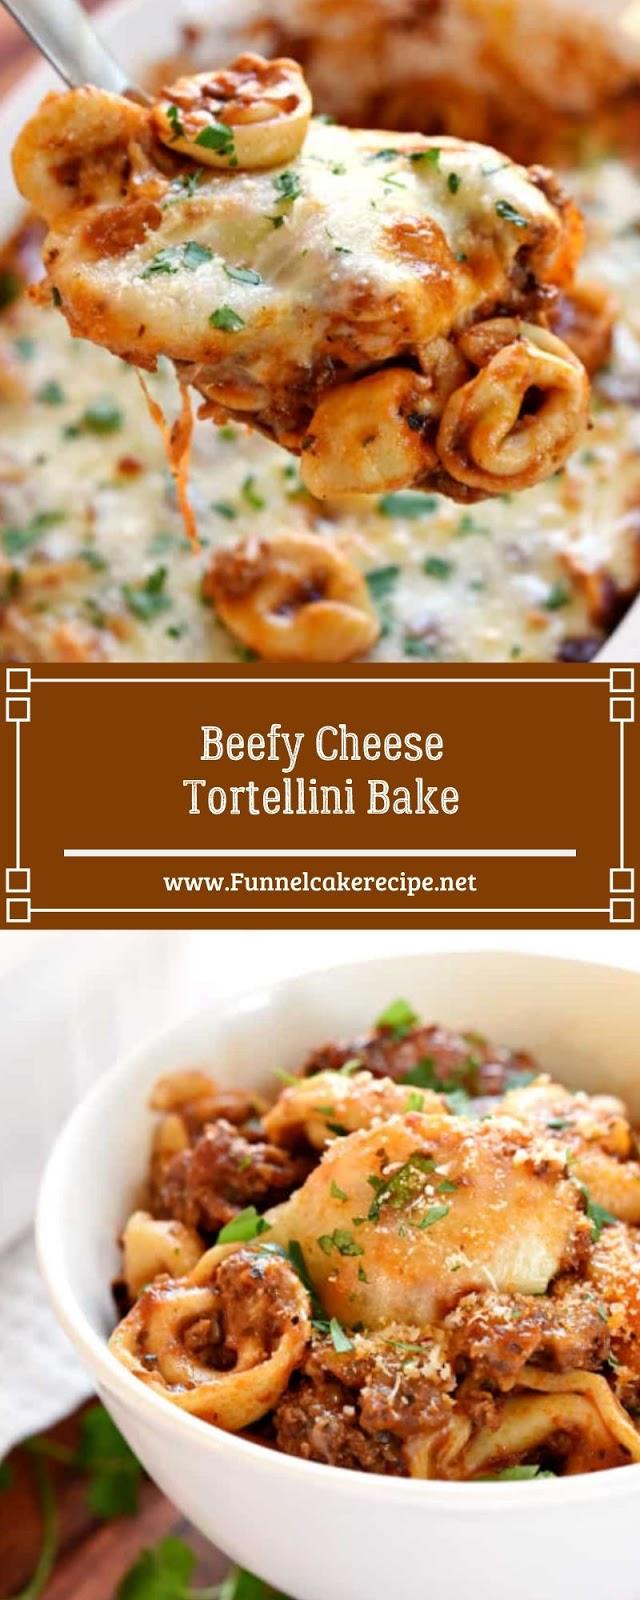 Beefy Cheese Tortellini Bake